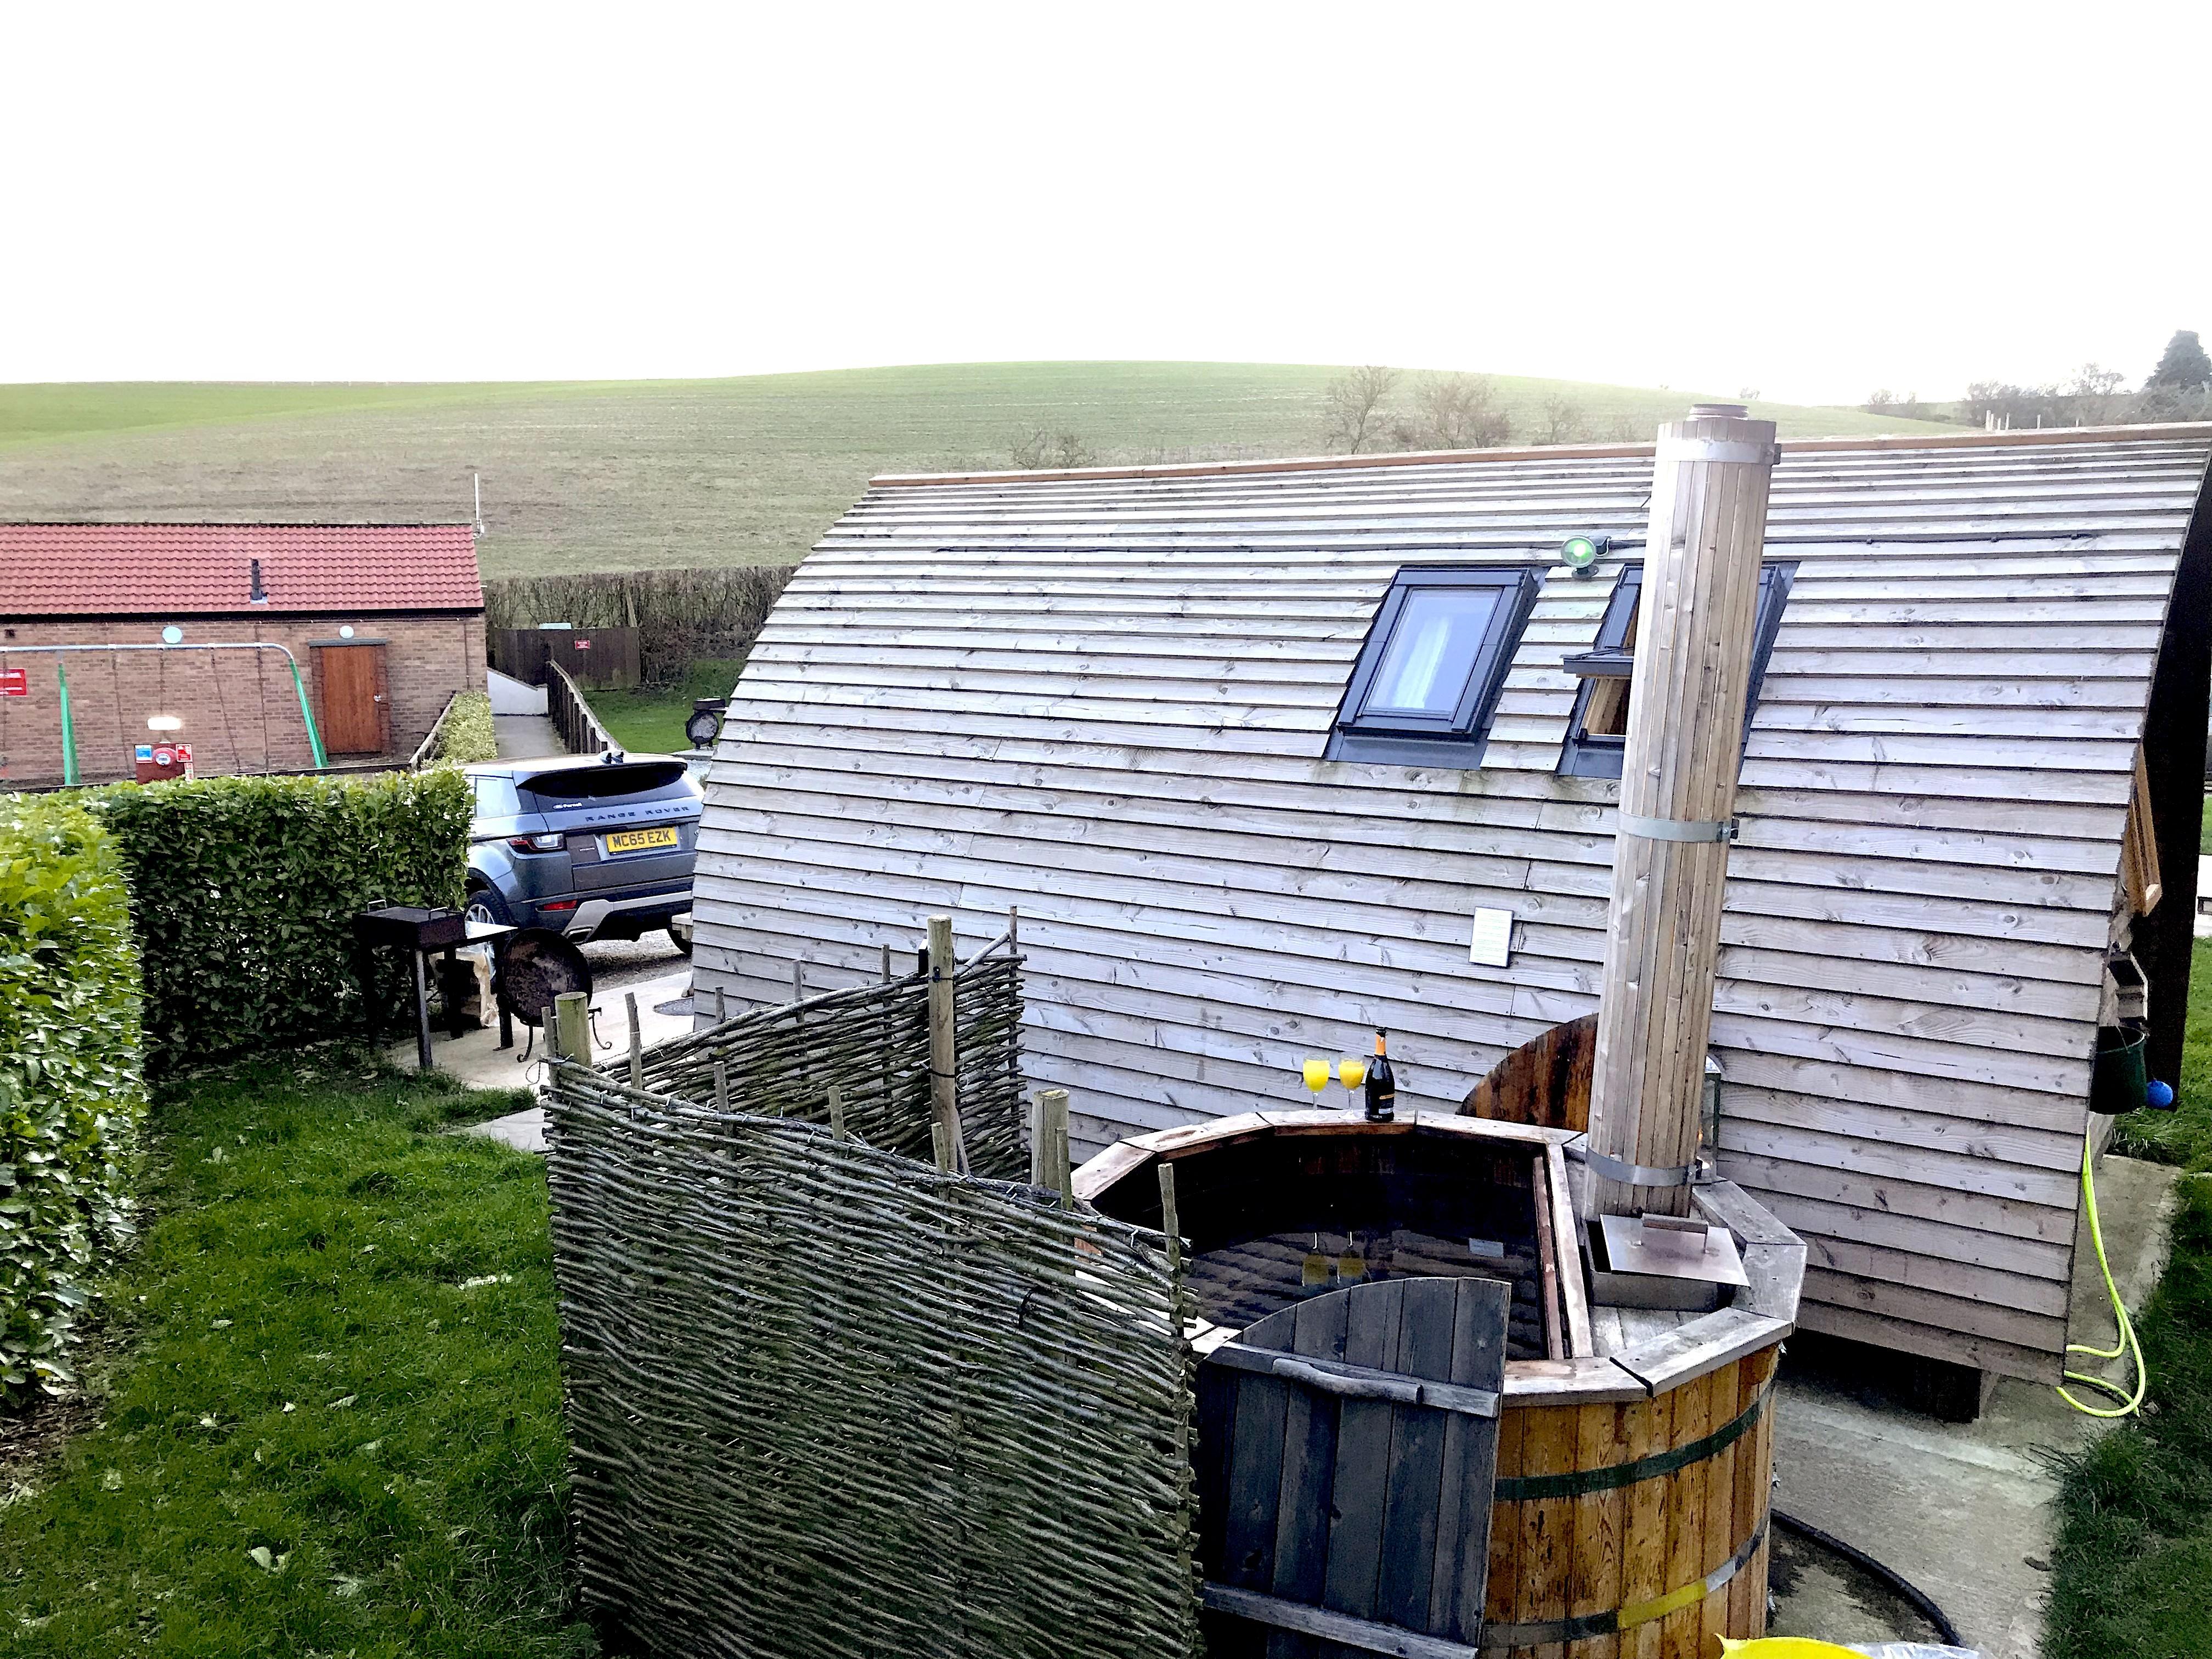 Humble_Bee_Farm_glamping_Yorkshire_Travel_The_Harrogate_Girl64